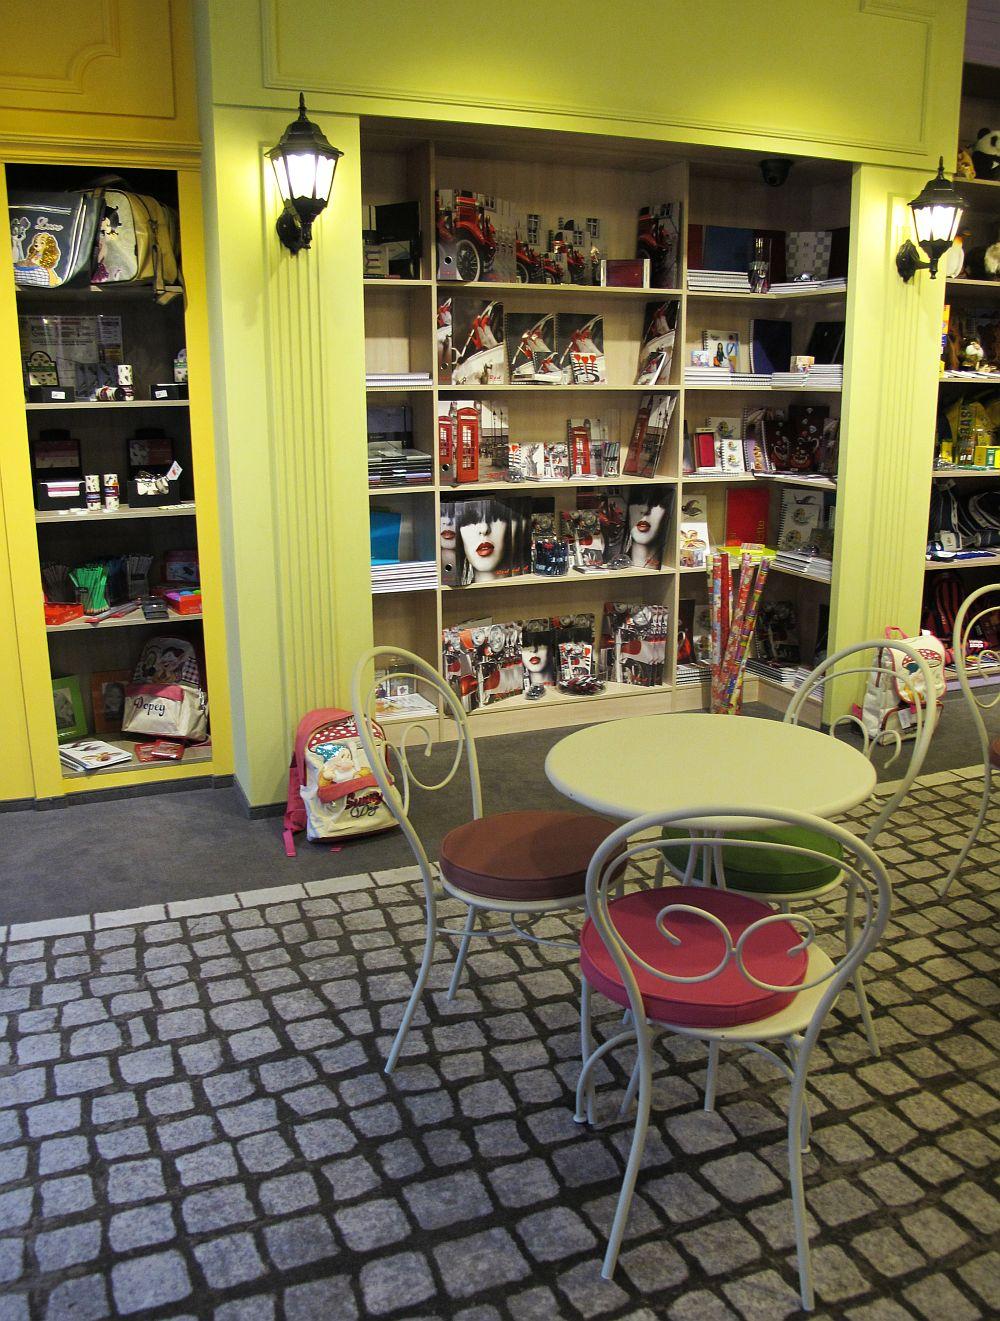 adelaparvu.com despre concept store papetarie Lolol, Dacris, design interior Prographic Studio Bucuresti (10)